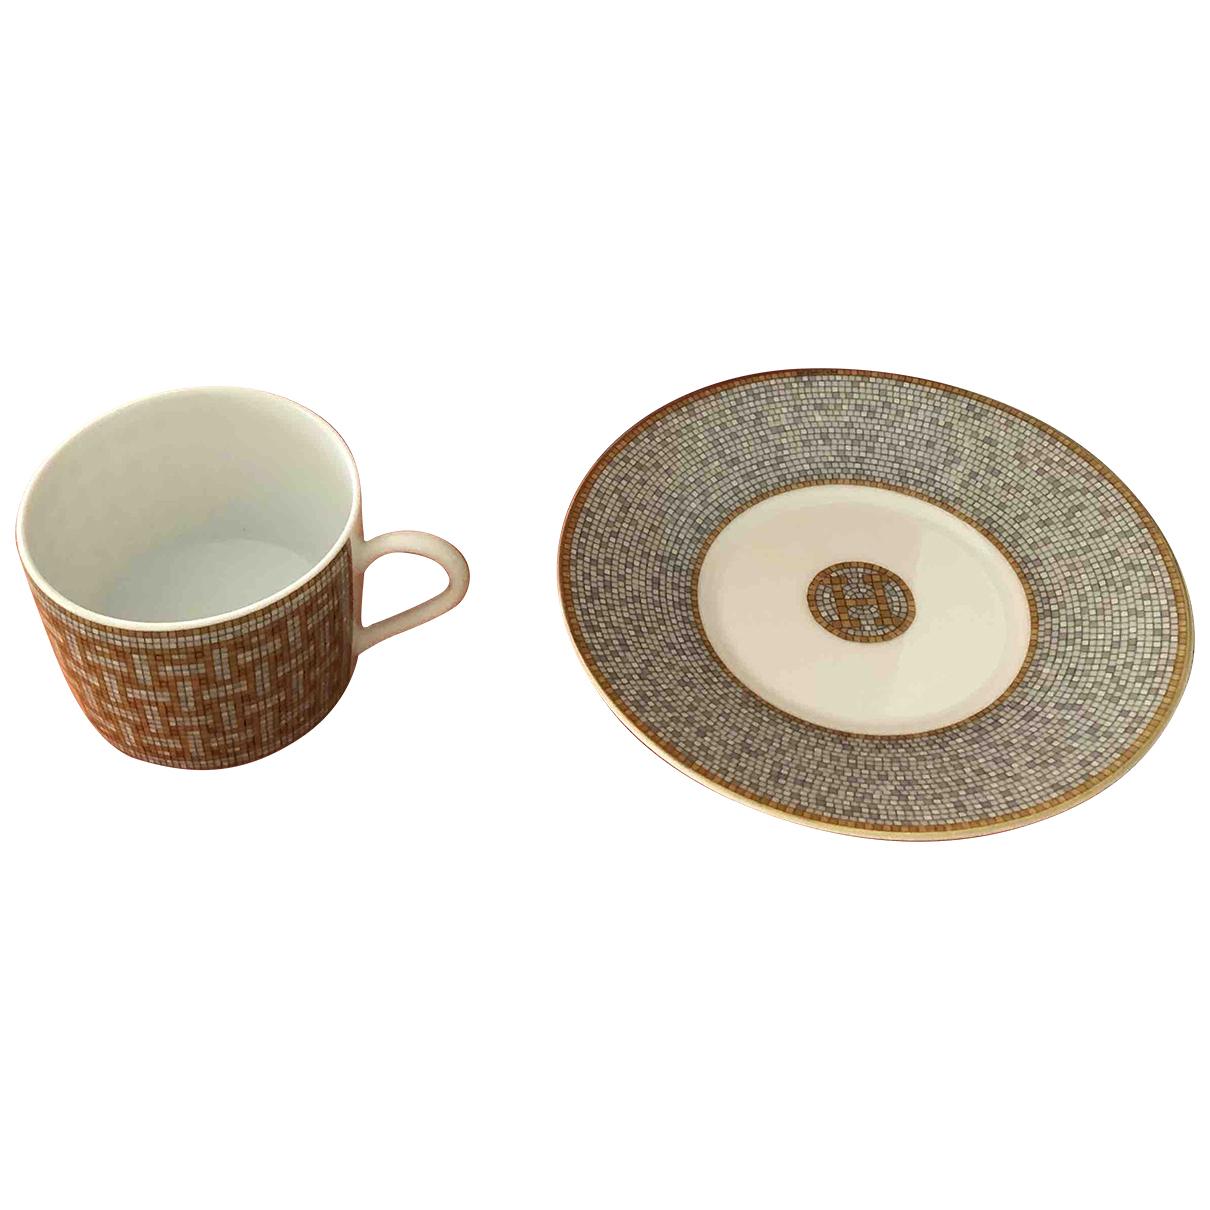 Hermes Mosaique au 24 Tischkultur in  Gold Porzellan